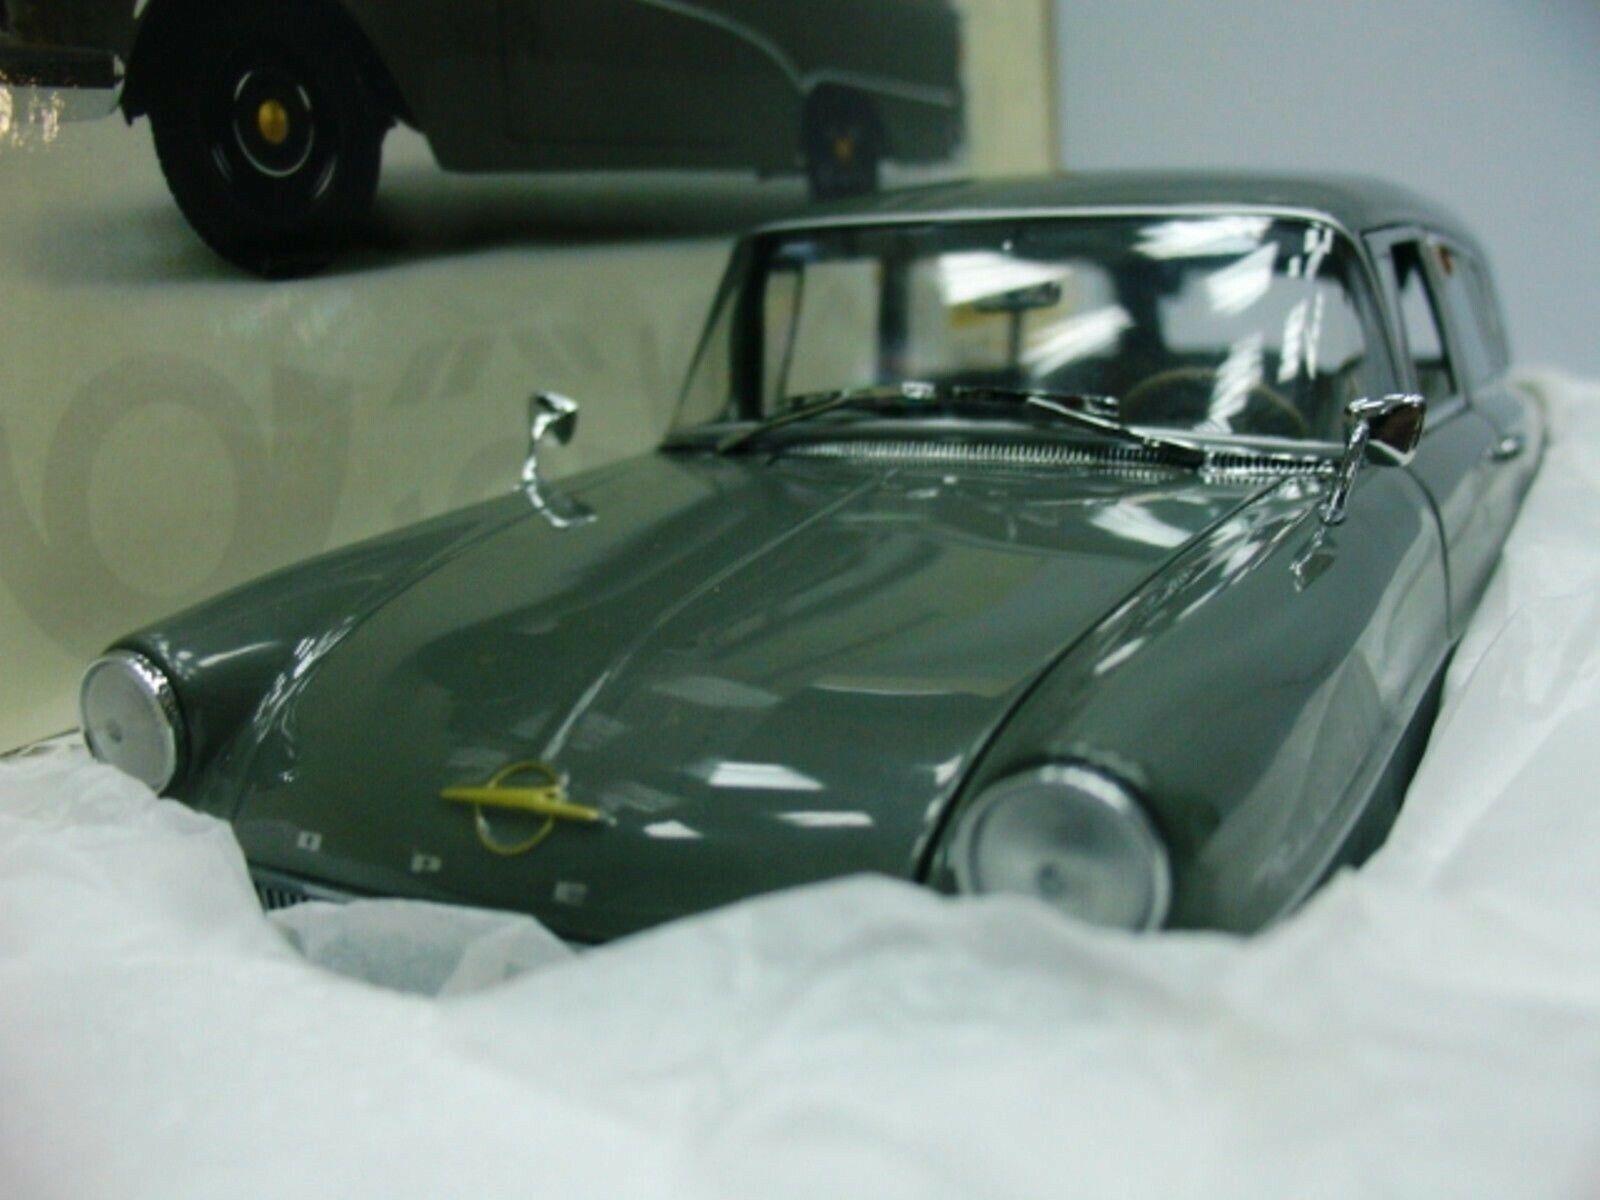 WOW EXTREMELY RARE Opel Rekord P1 Caravan 1957 Post 1 18 Minichamps-Auto Art